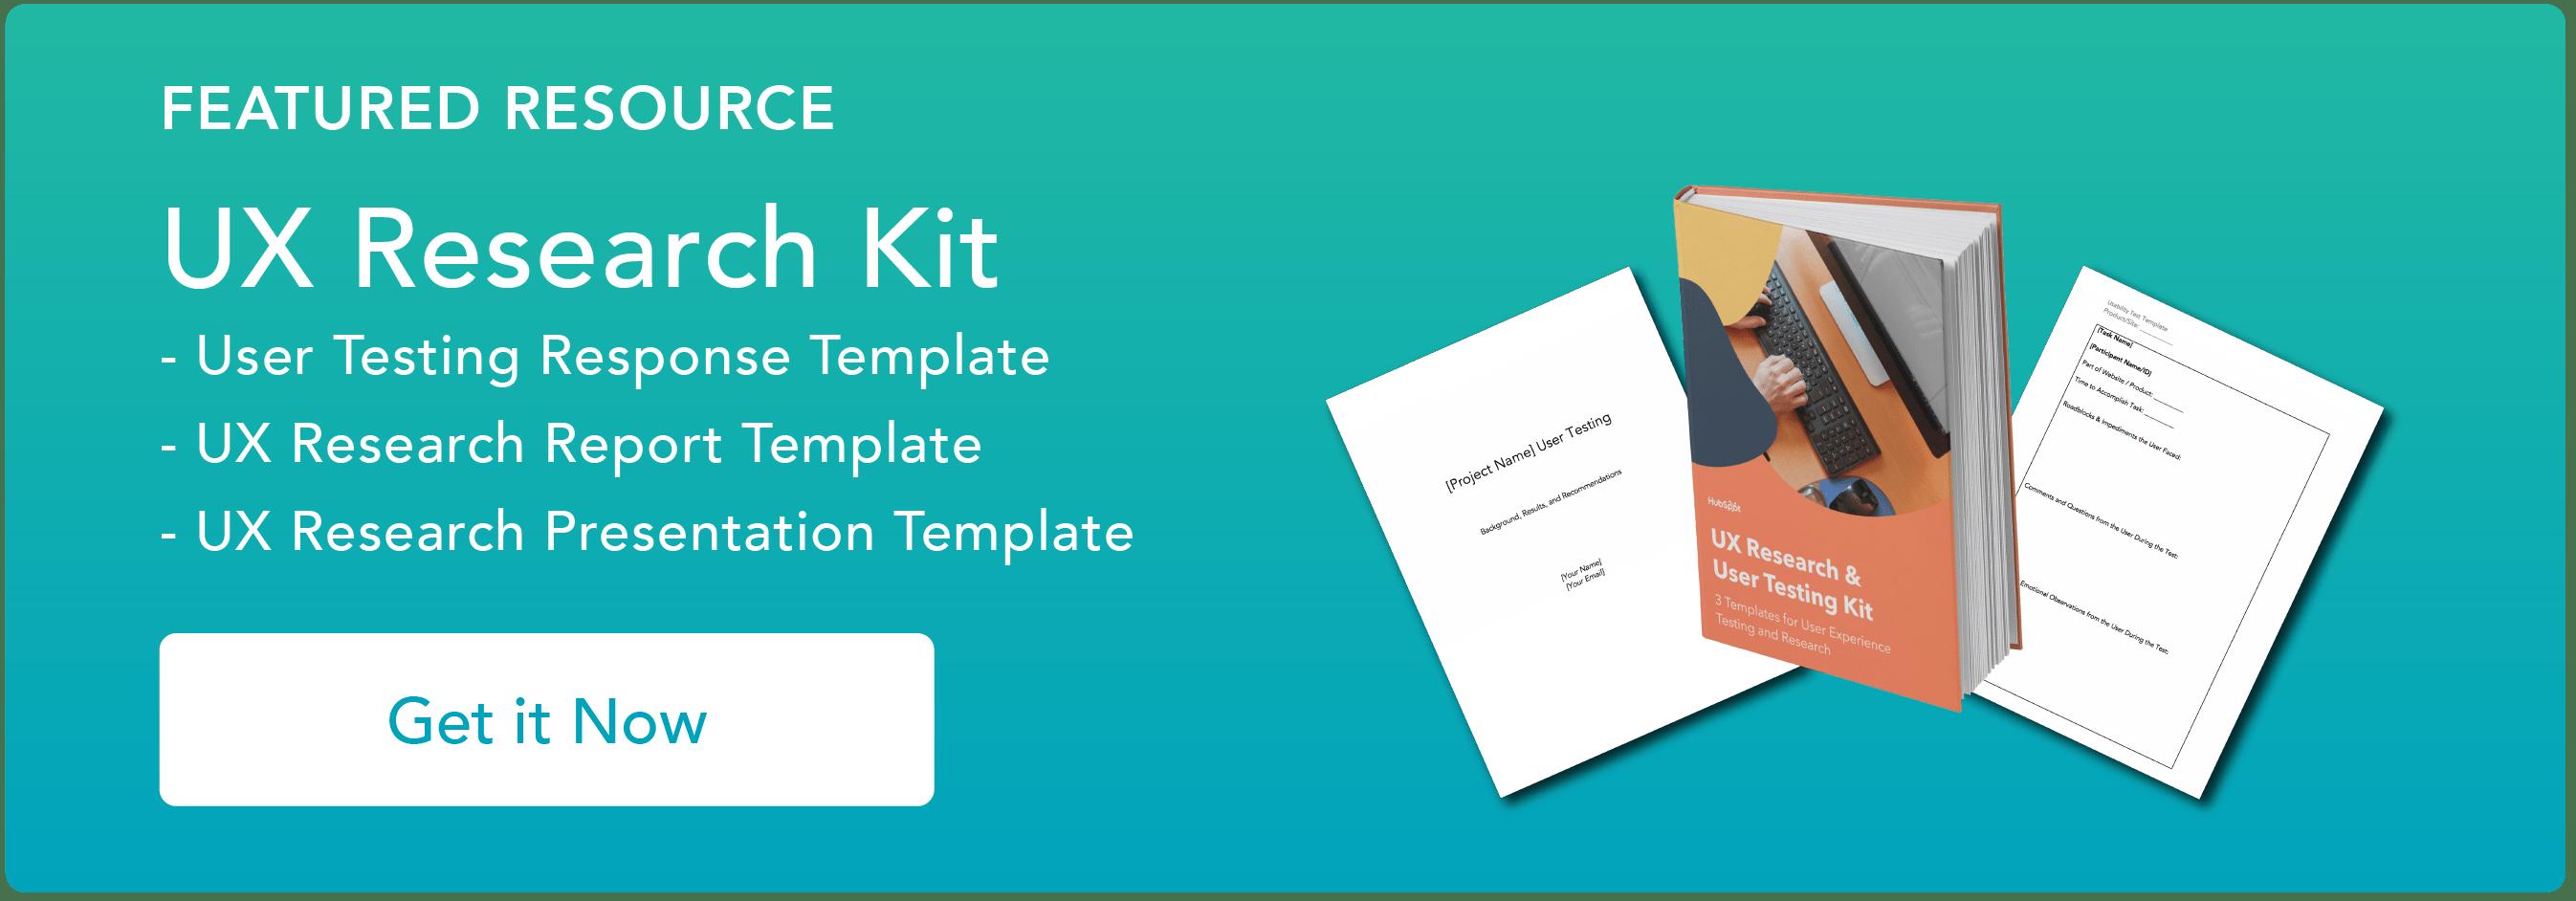 ux templates